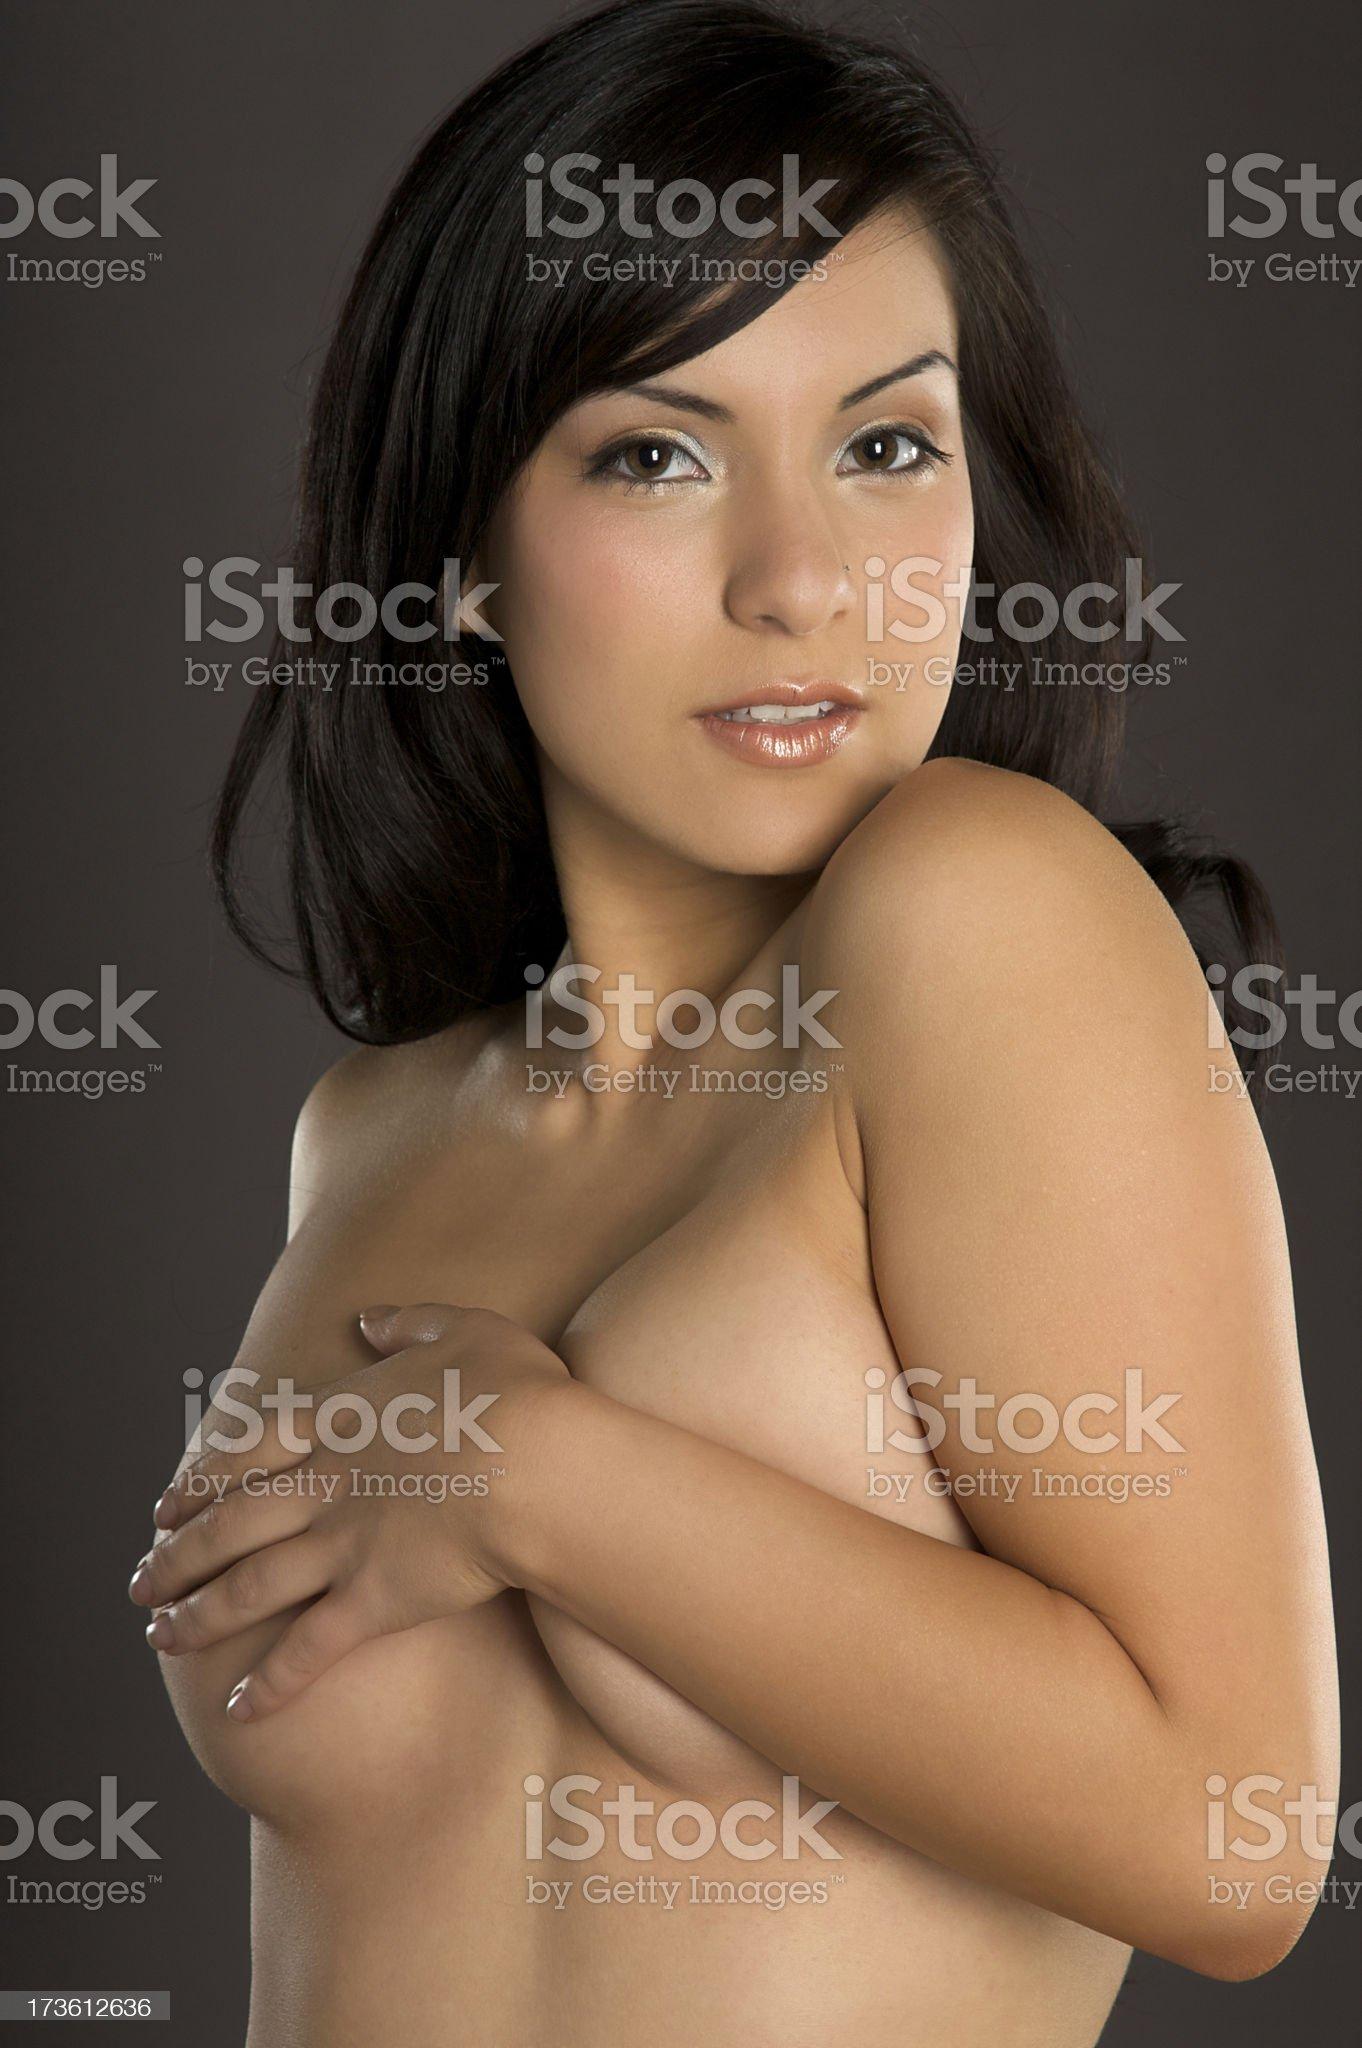 Topless Hispanic Girl royalty-free stock photo